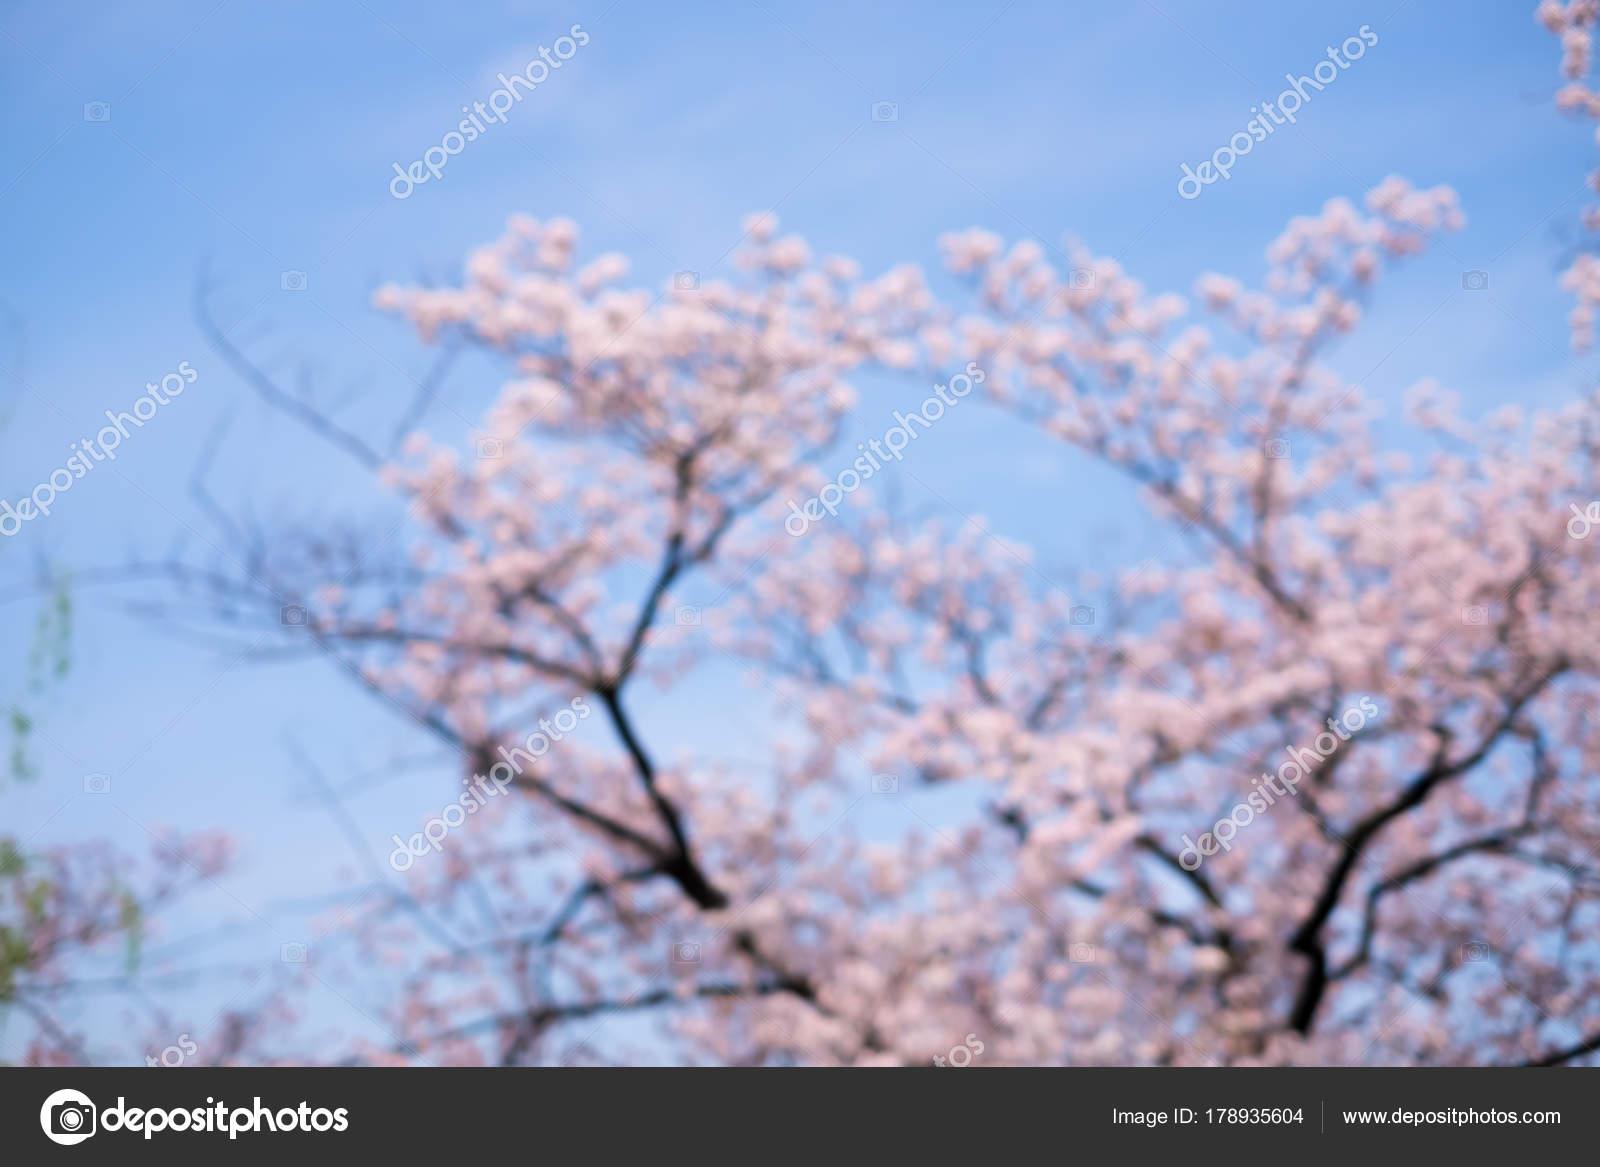 Scene Fleur Cerisier Floue Tournee Japon Photographie Ryanking999